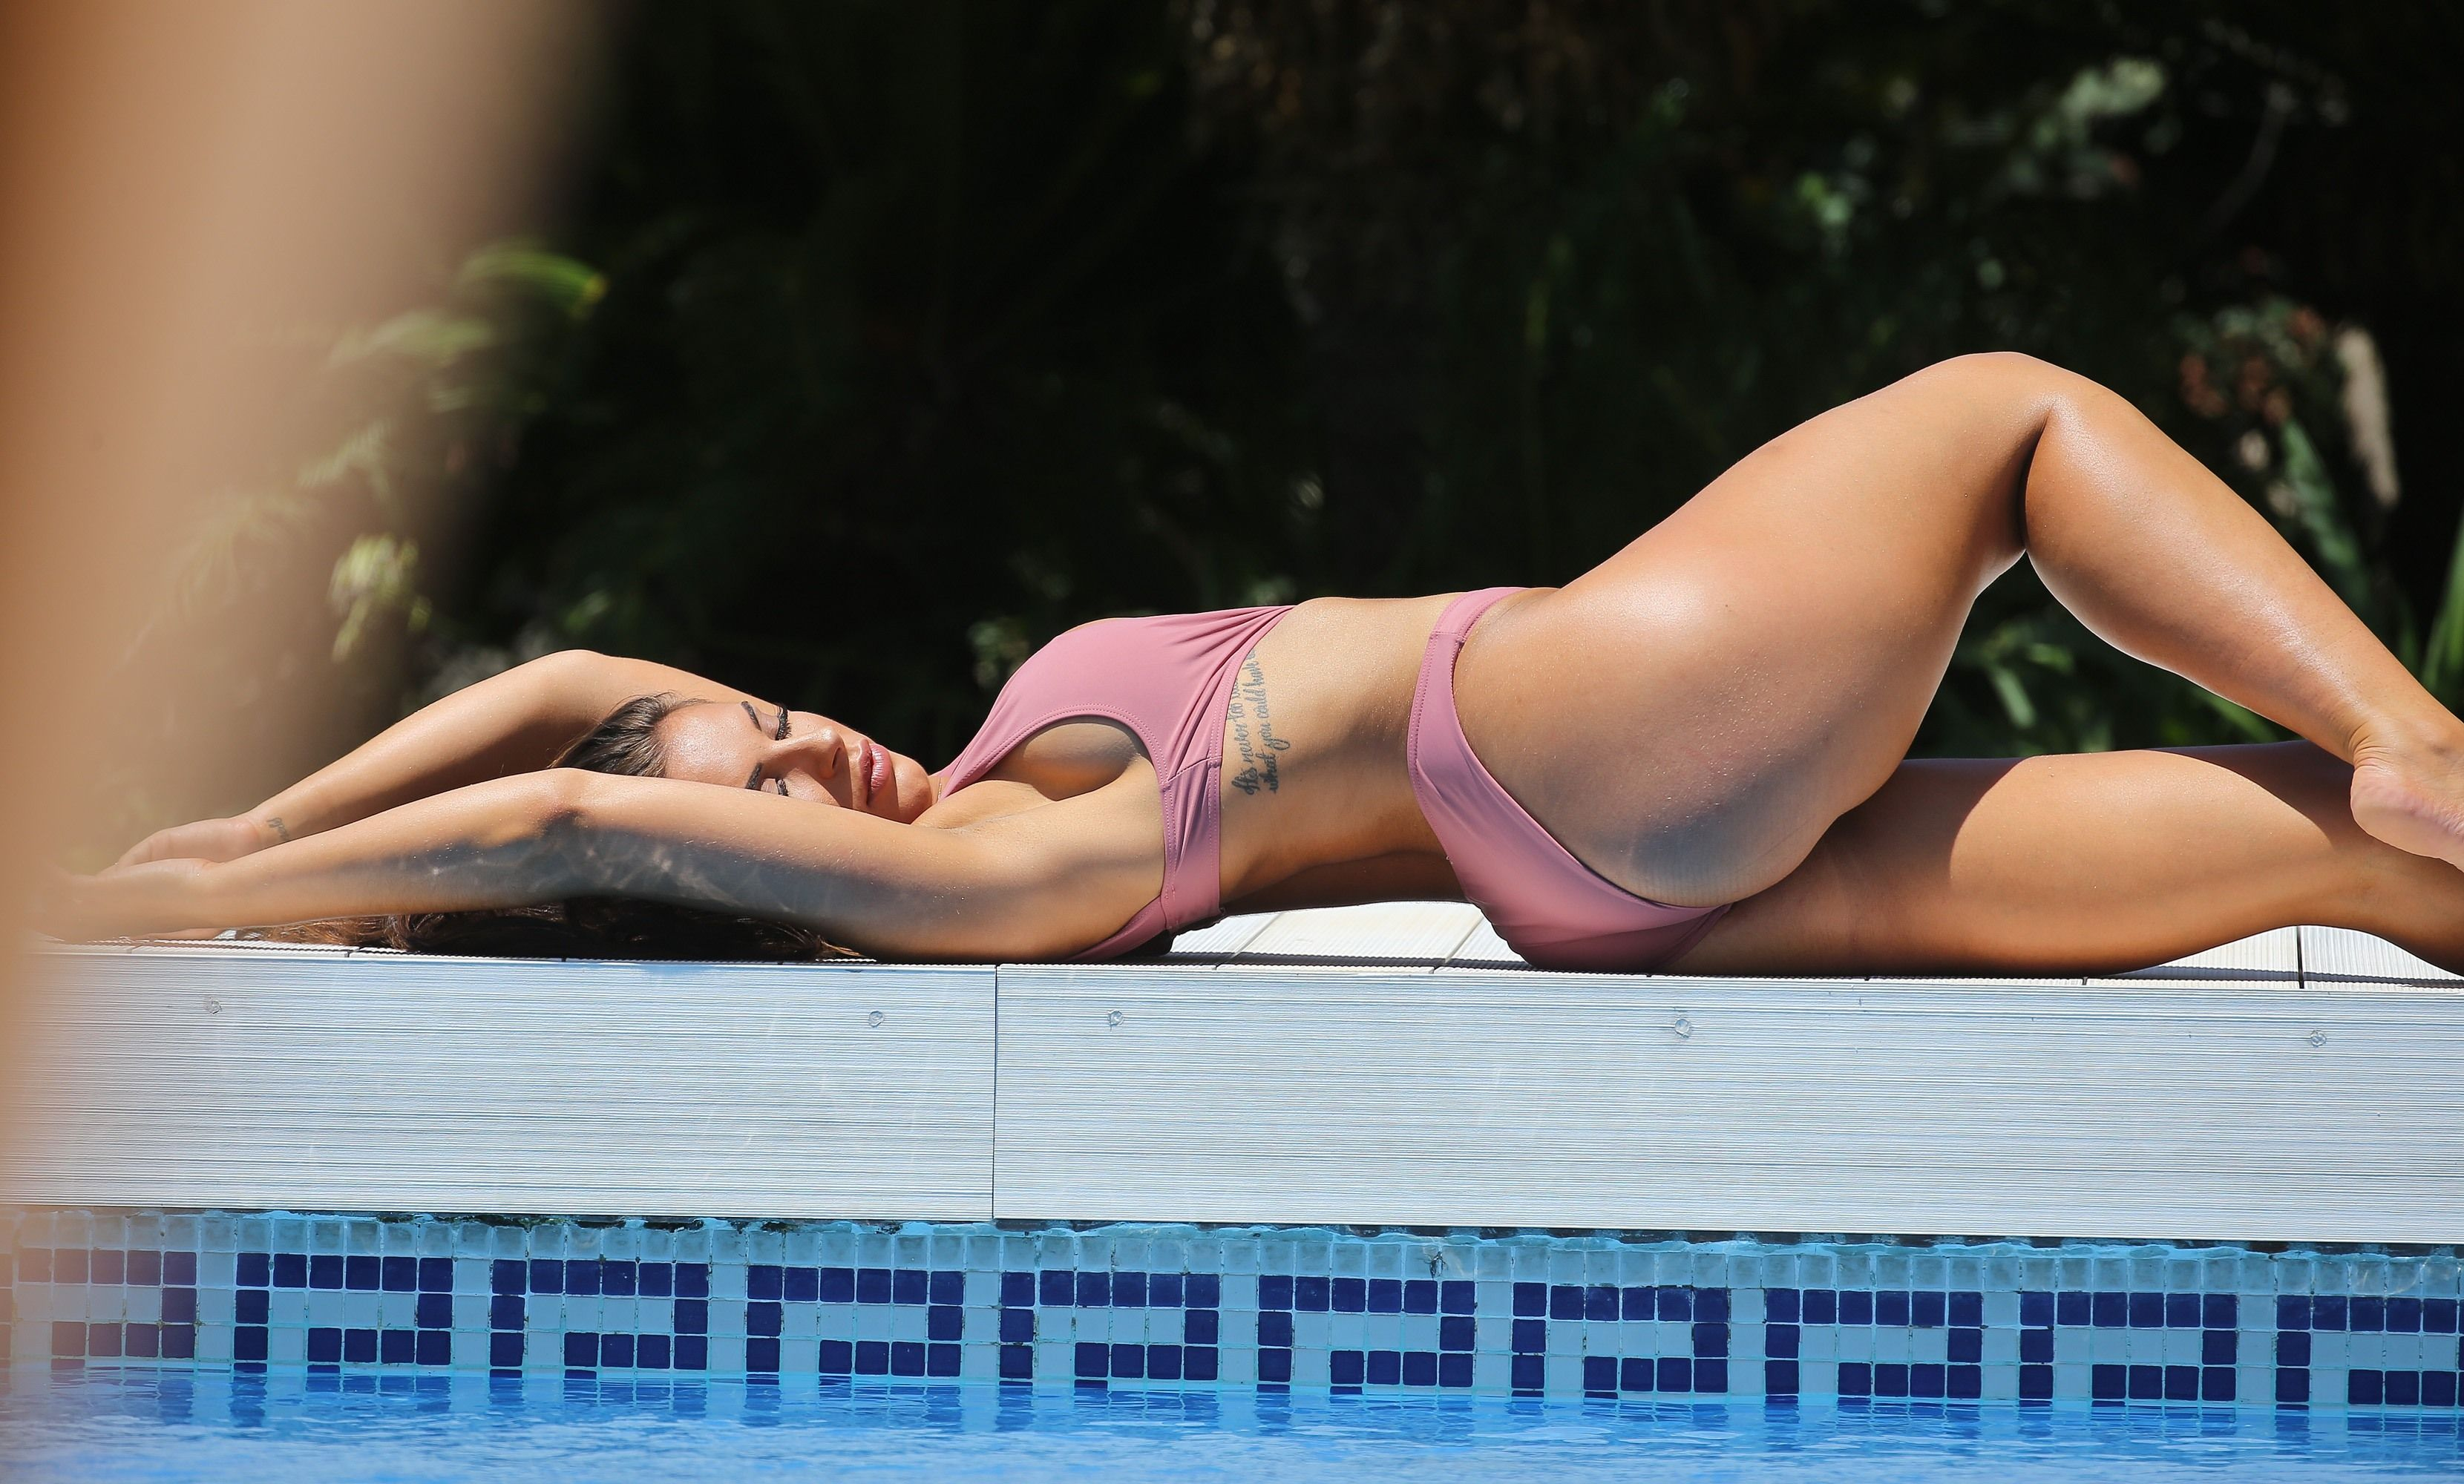 Jessica Shears Porn